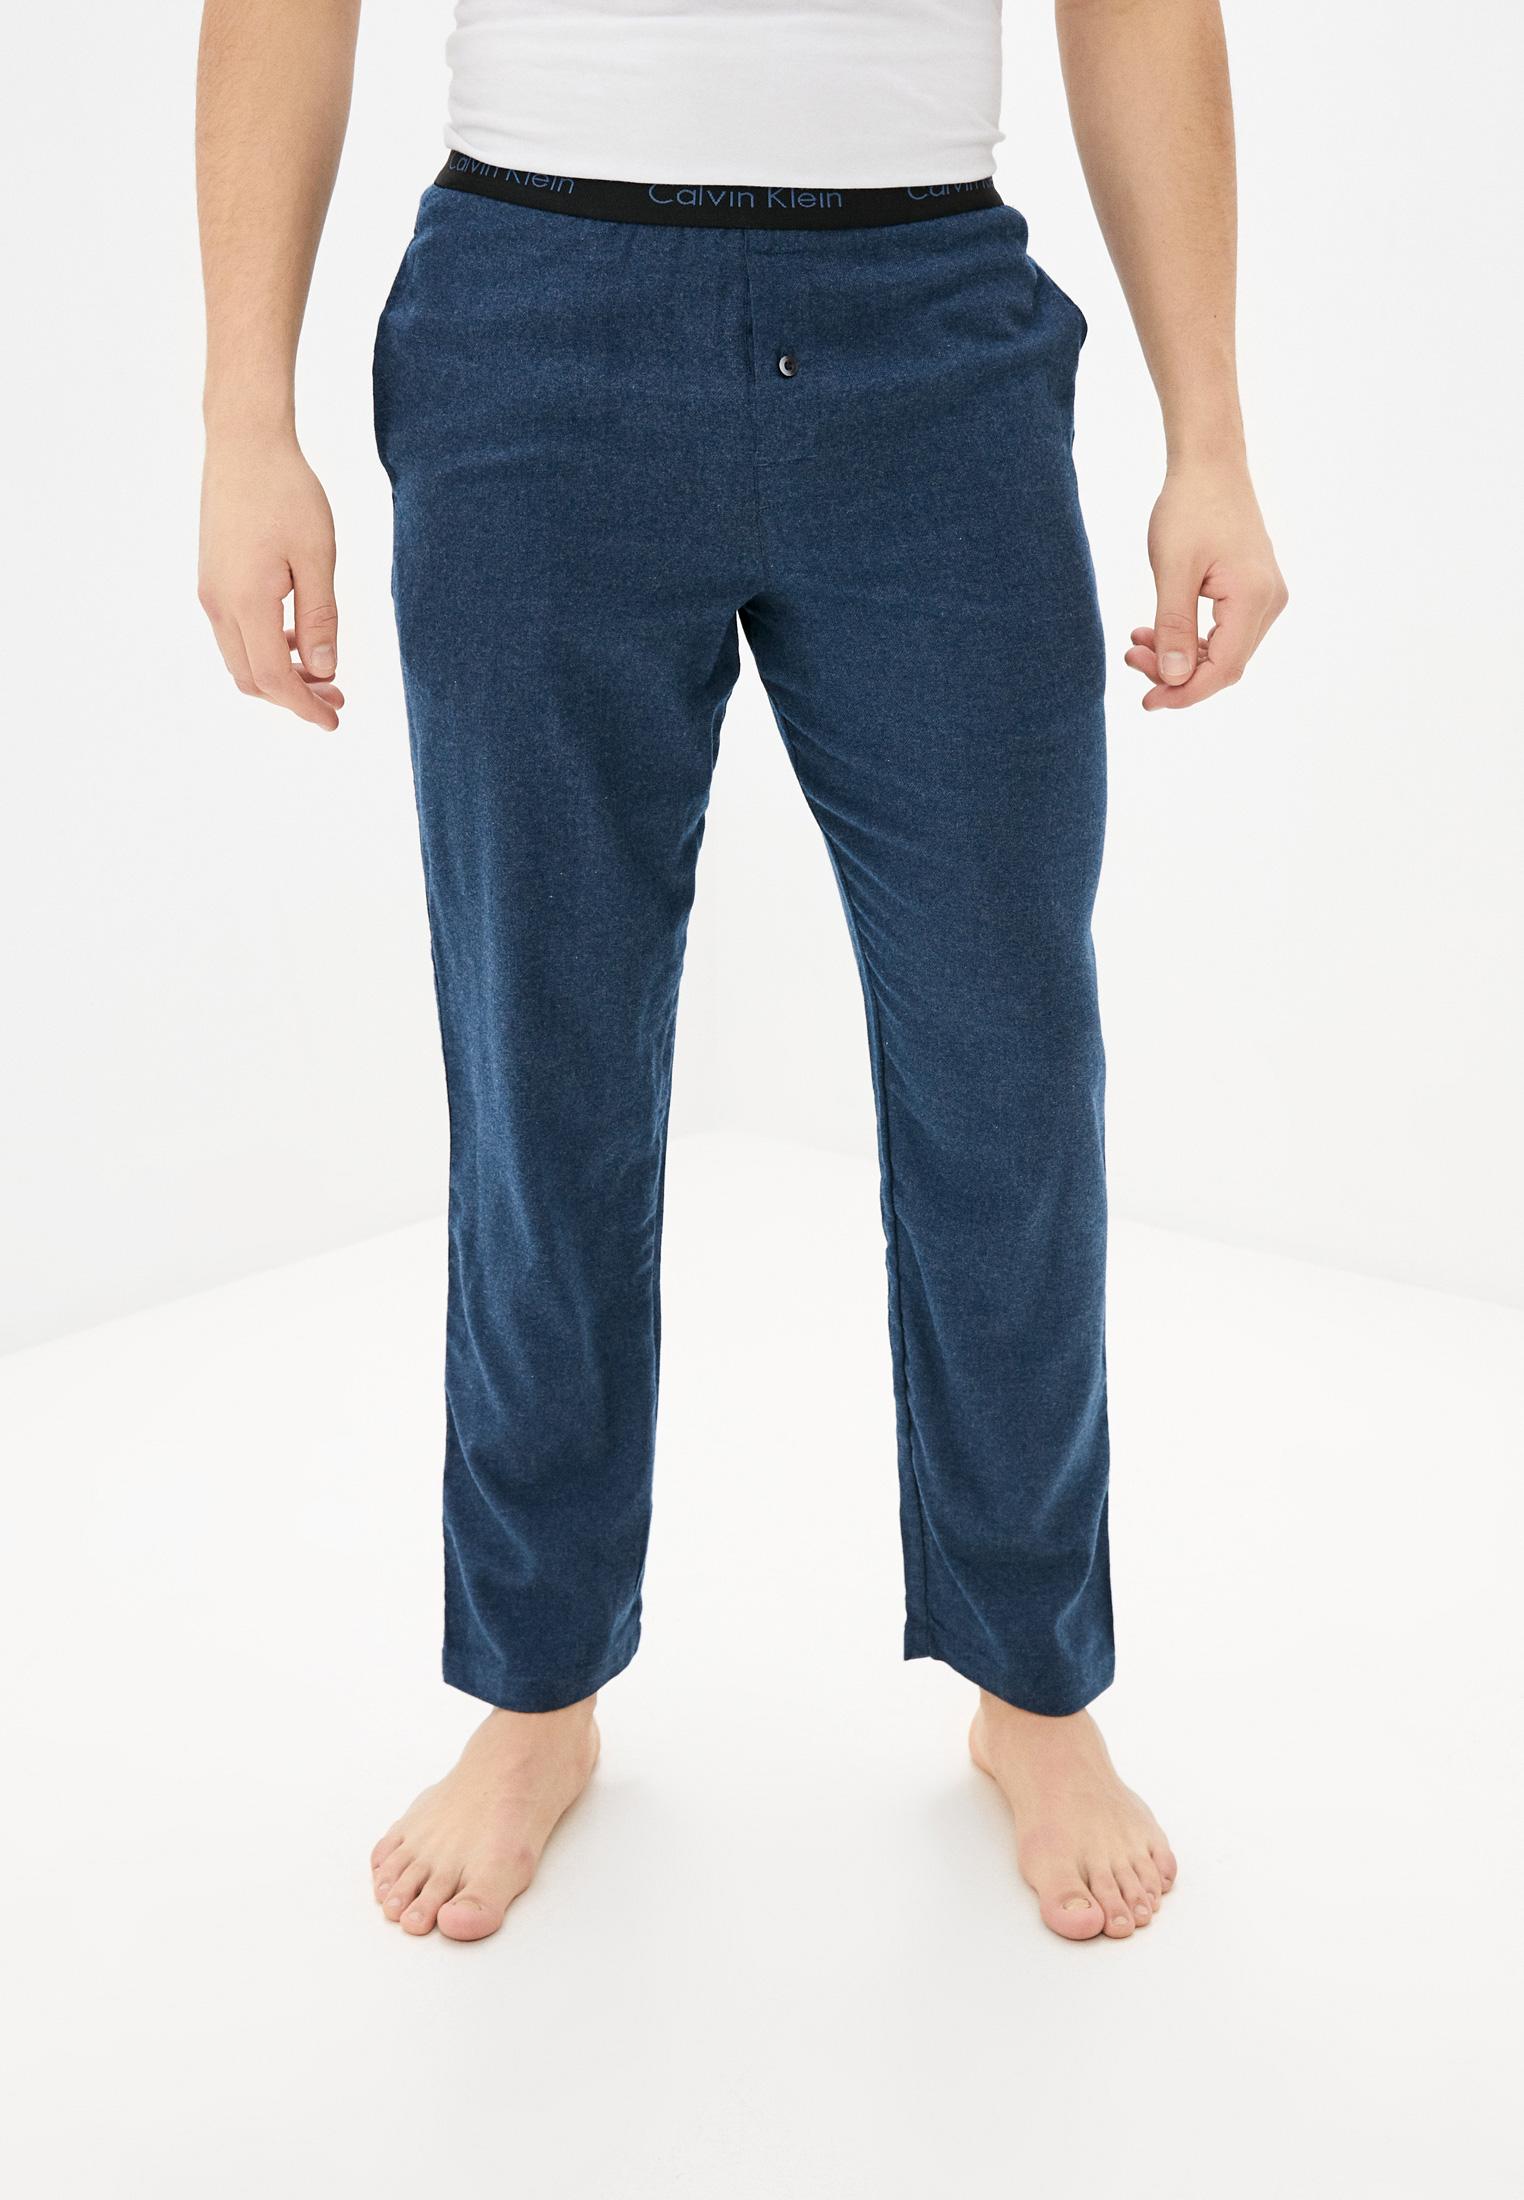 Мужские домашние брюки Calvin Klein Underwear (Кельвин Кляйн Андервеар) NM1429E